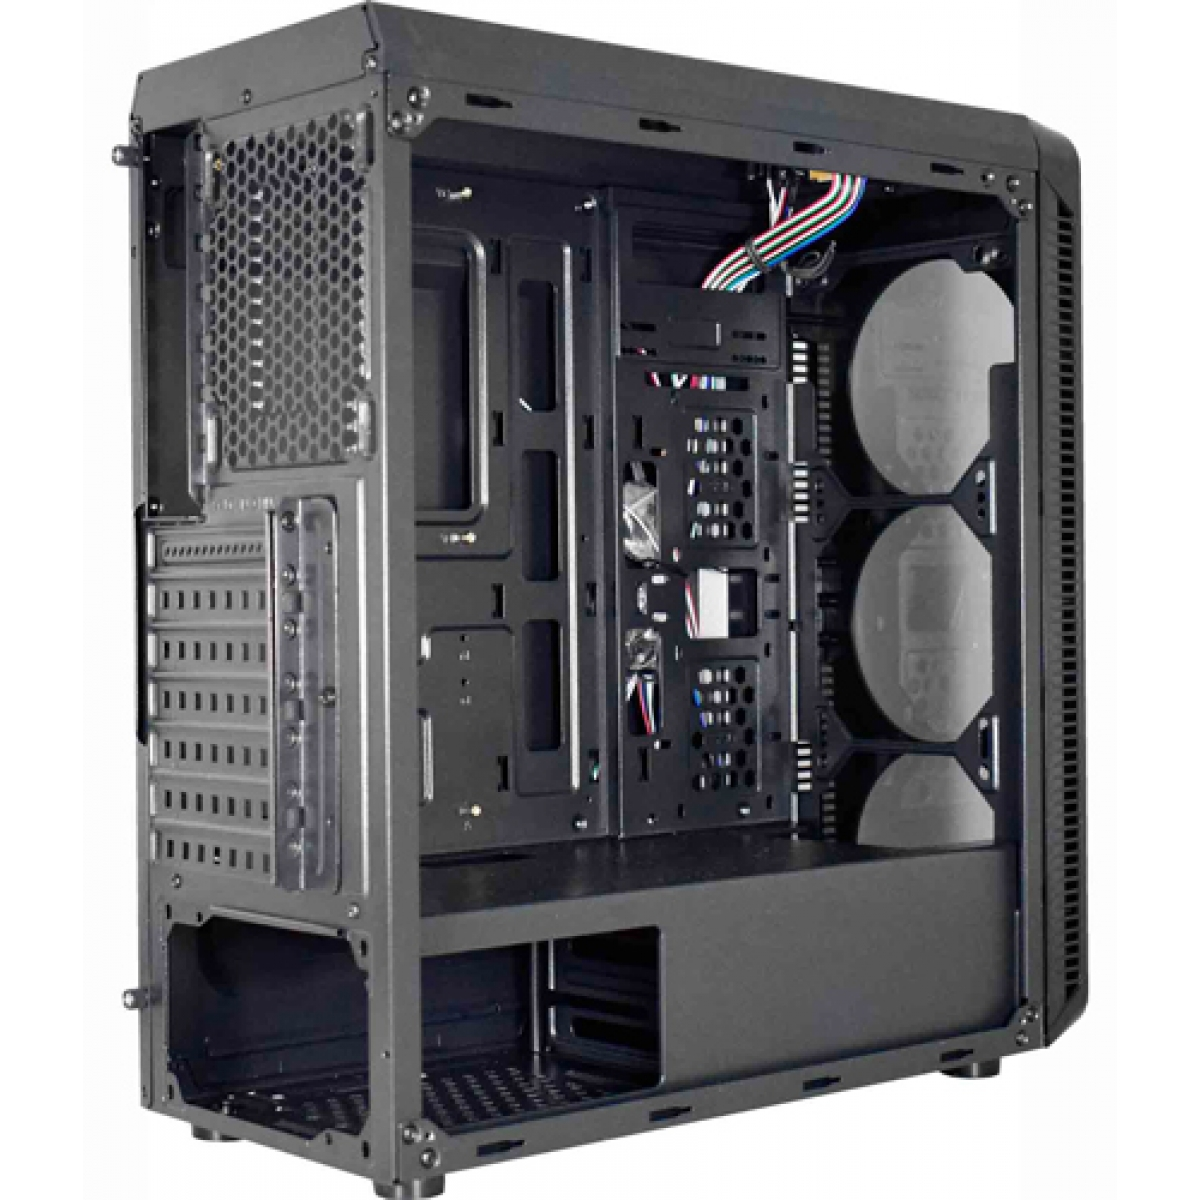 Gabinete Gamer K-mex Infinity III, Mid Tower, Com 3 Fans RGB, Lateral em Acrílico, Black, S-Fonte, CG-03G8